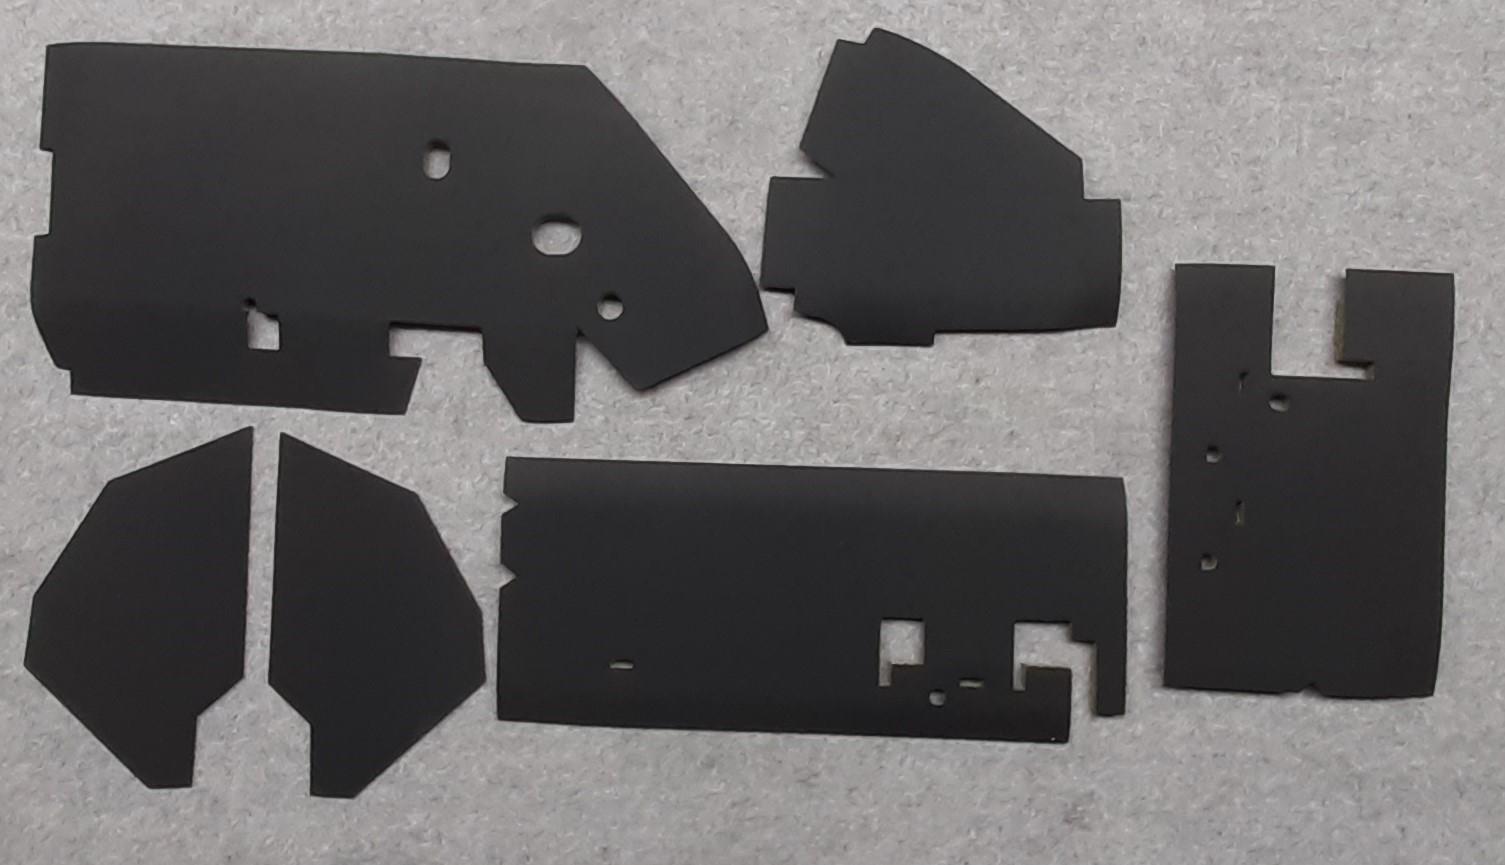 Innenverkleidungs-/ Dämmungsmaterial 6-teilig innen -Top-Qualität / wie Original-, 2CV ab 03/1978 & AK